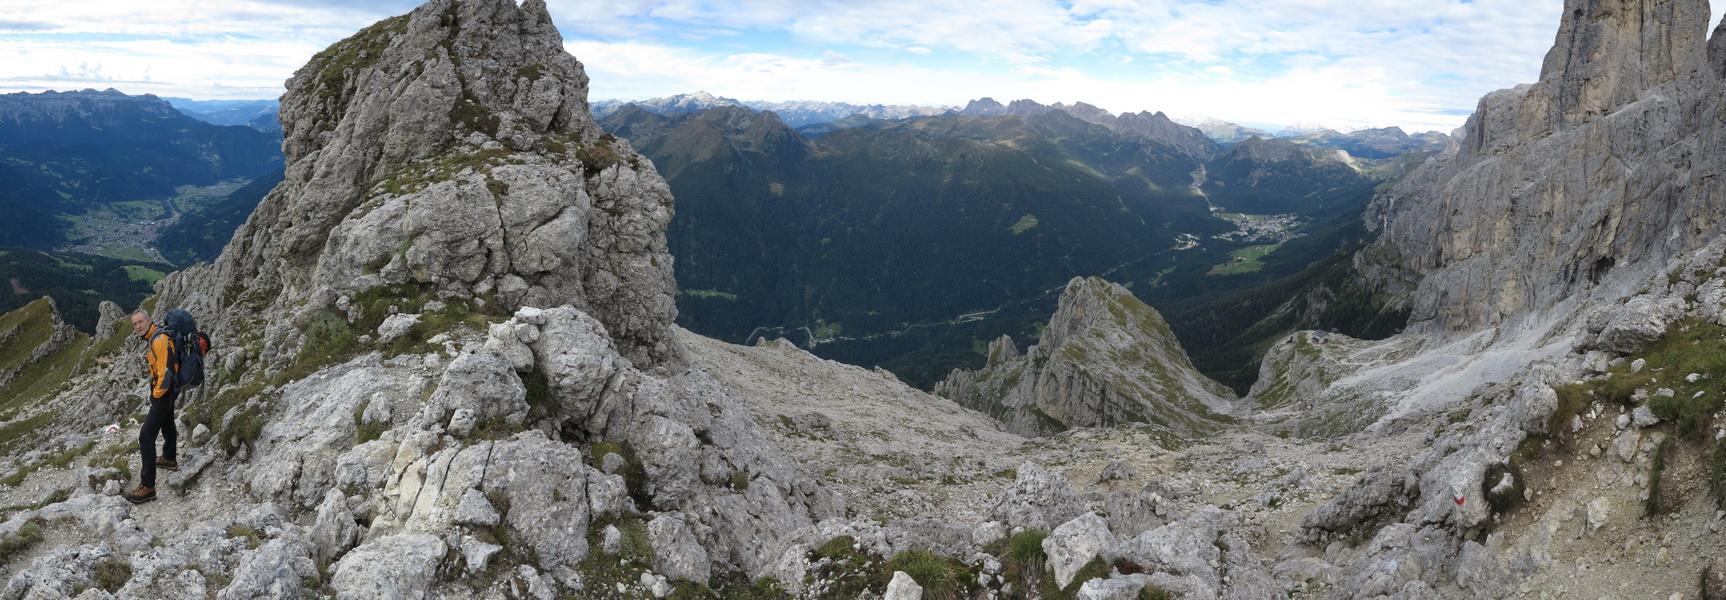 Panorama von der Cima di Stanga 2550m